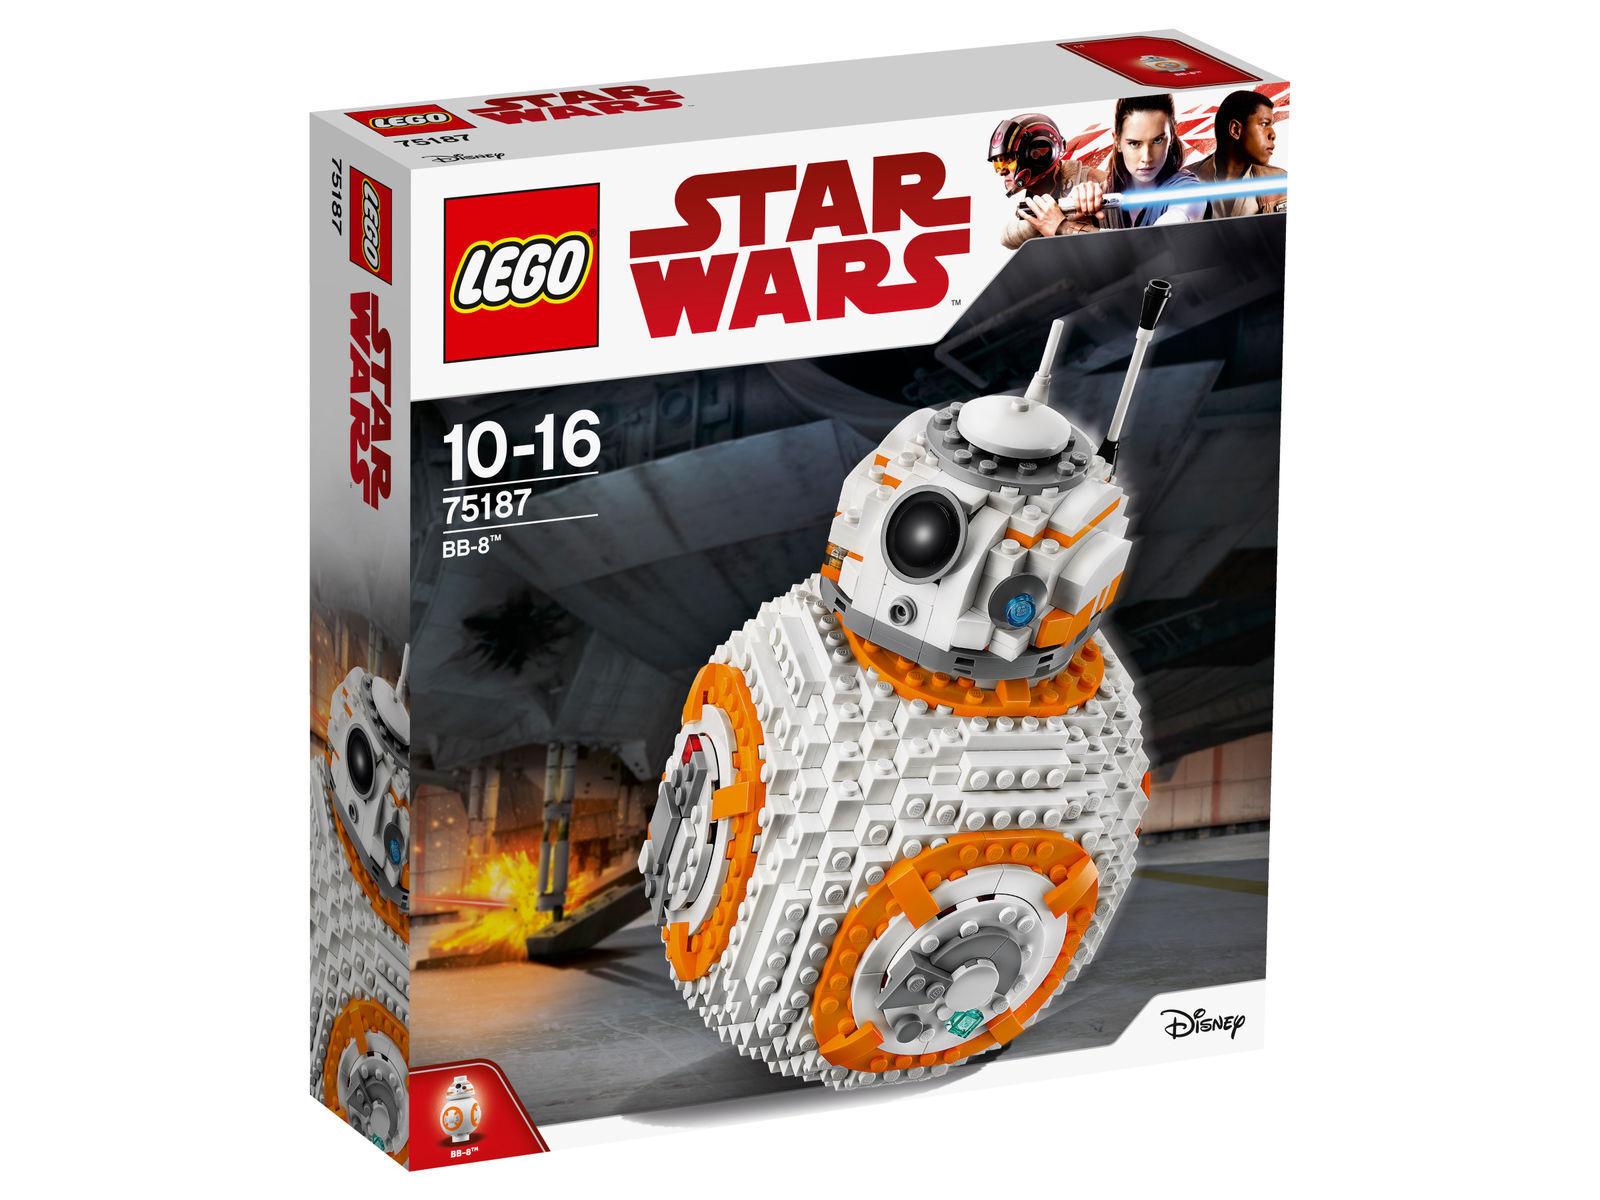 Lego Star Wars 75187-bb-8 - Neuf dans la neuf dans sa boîte